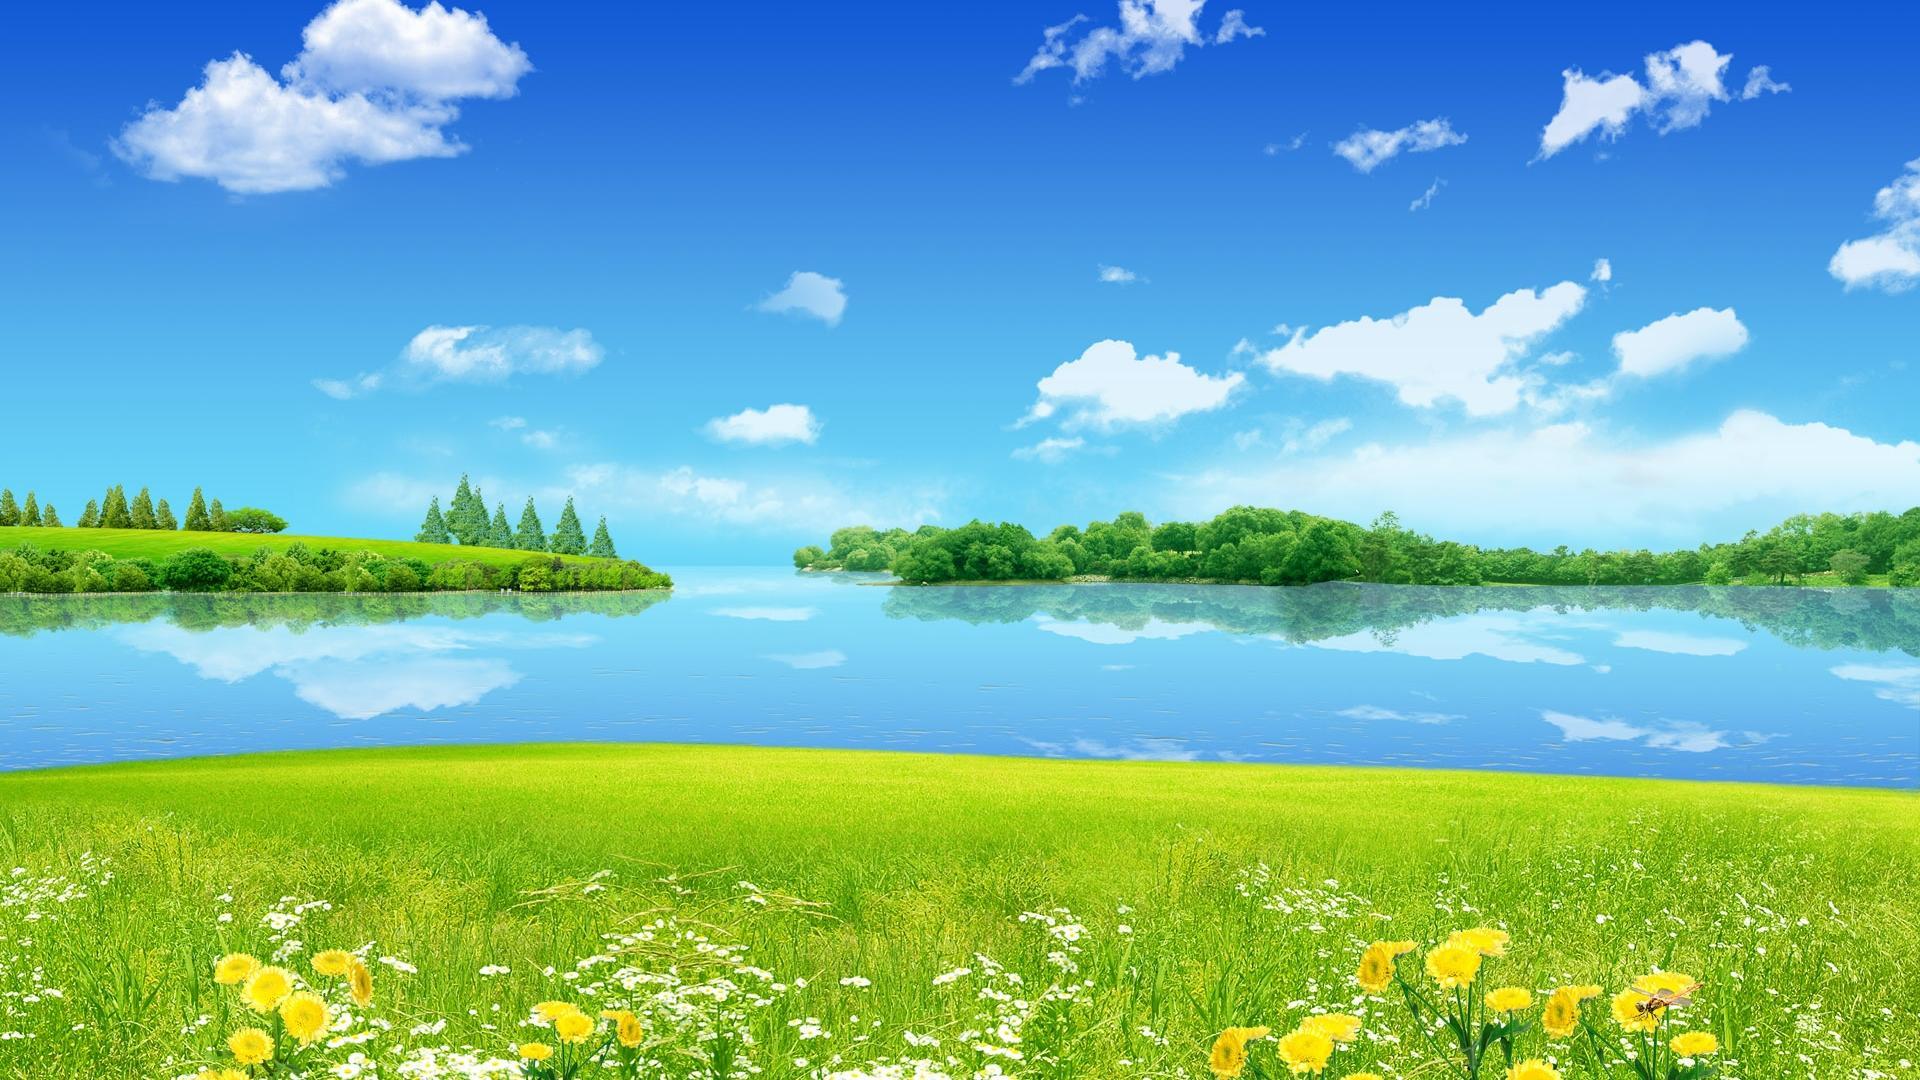 Free Wallpaper Download For Pc 3d Summer Desktop Wallpaper Background Hd Pixelstalk Net